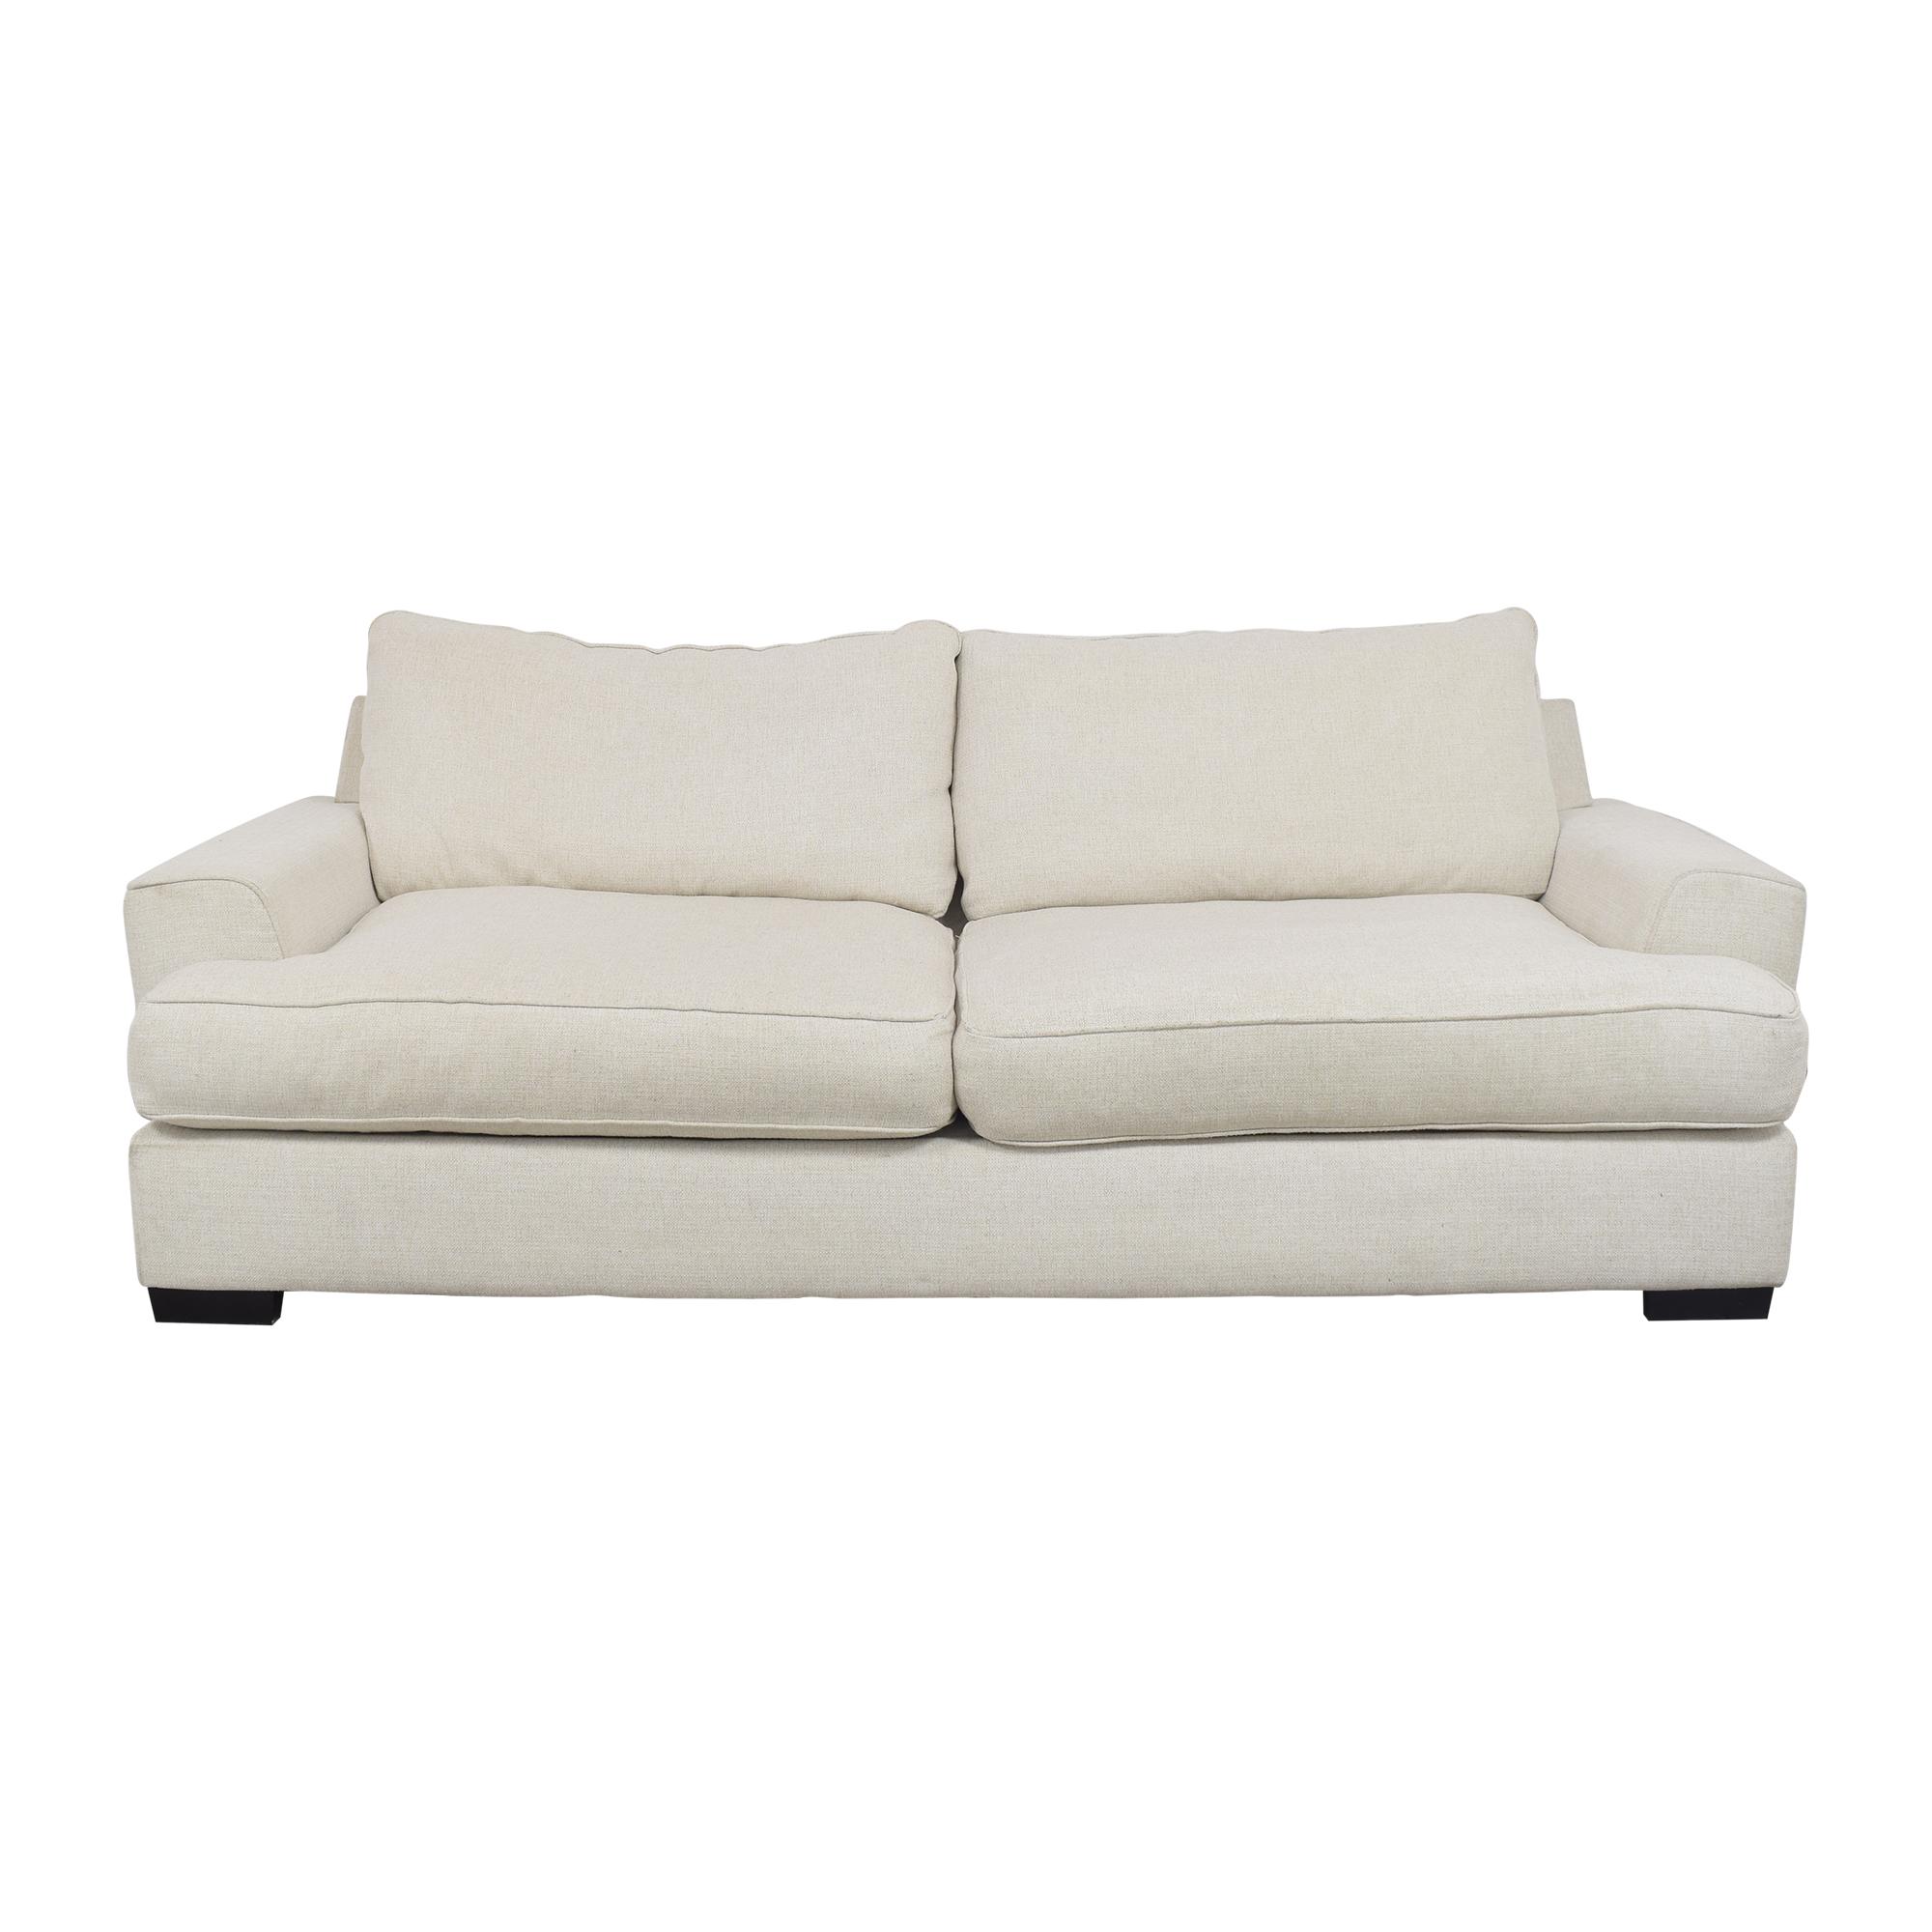 Macy's Macy's Ainsley Sofa pa